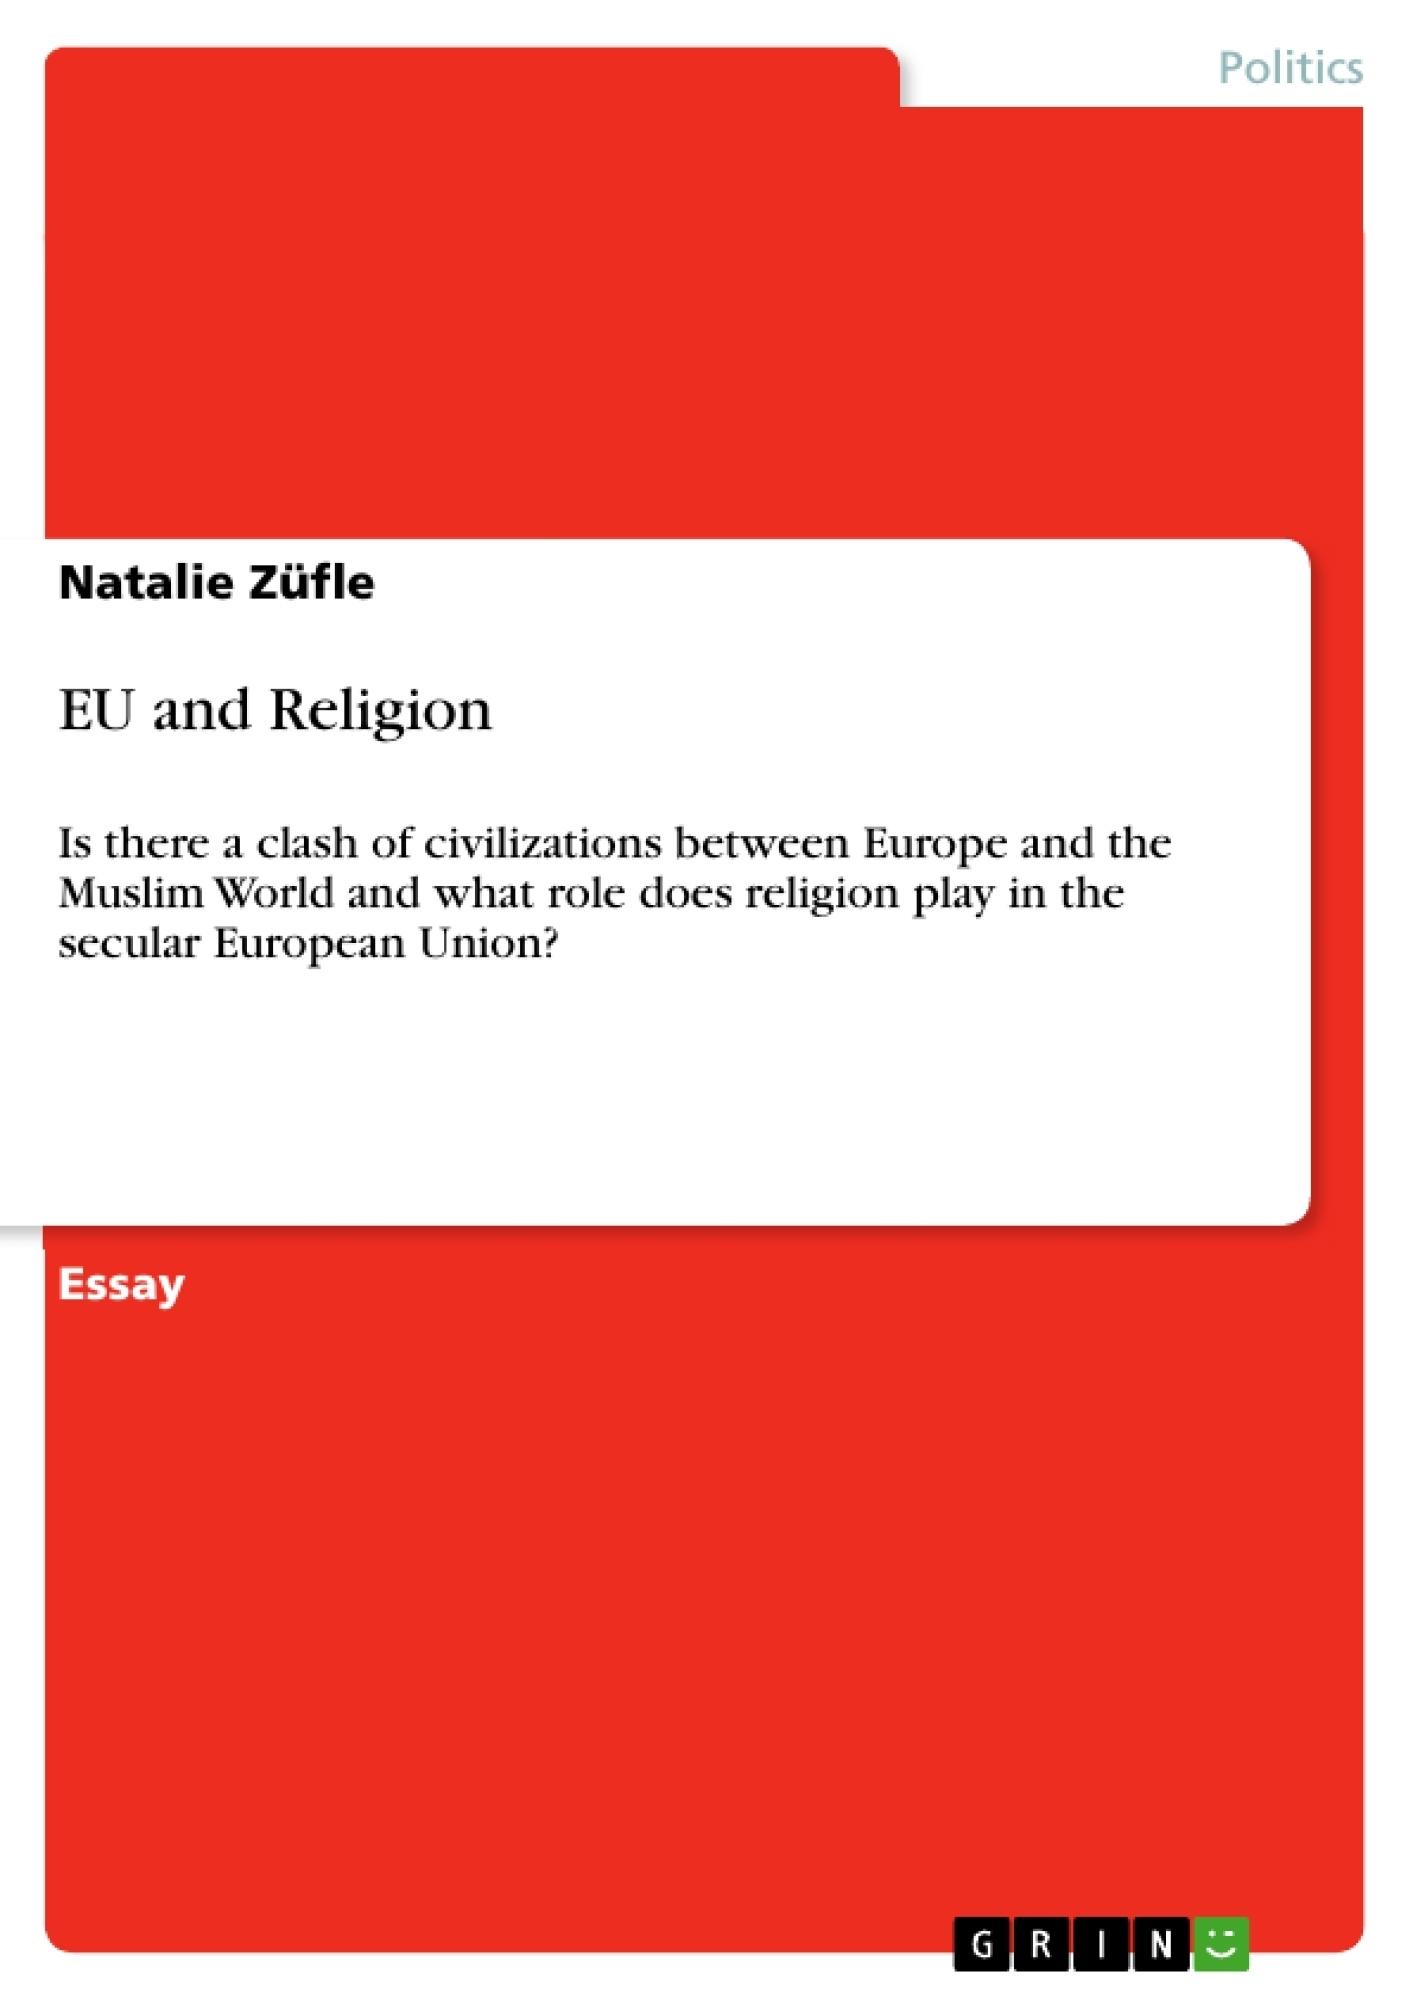 Title: EU and Religion